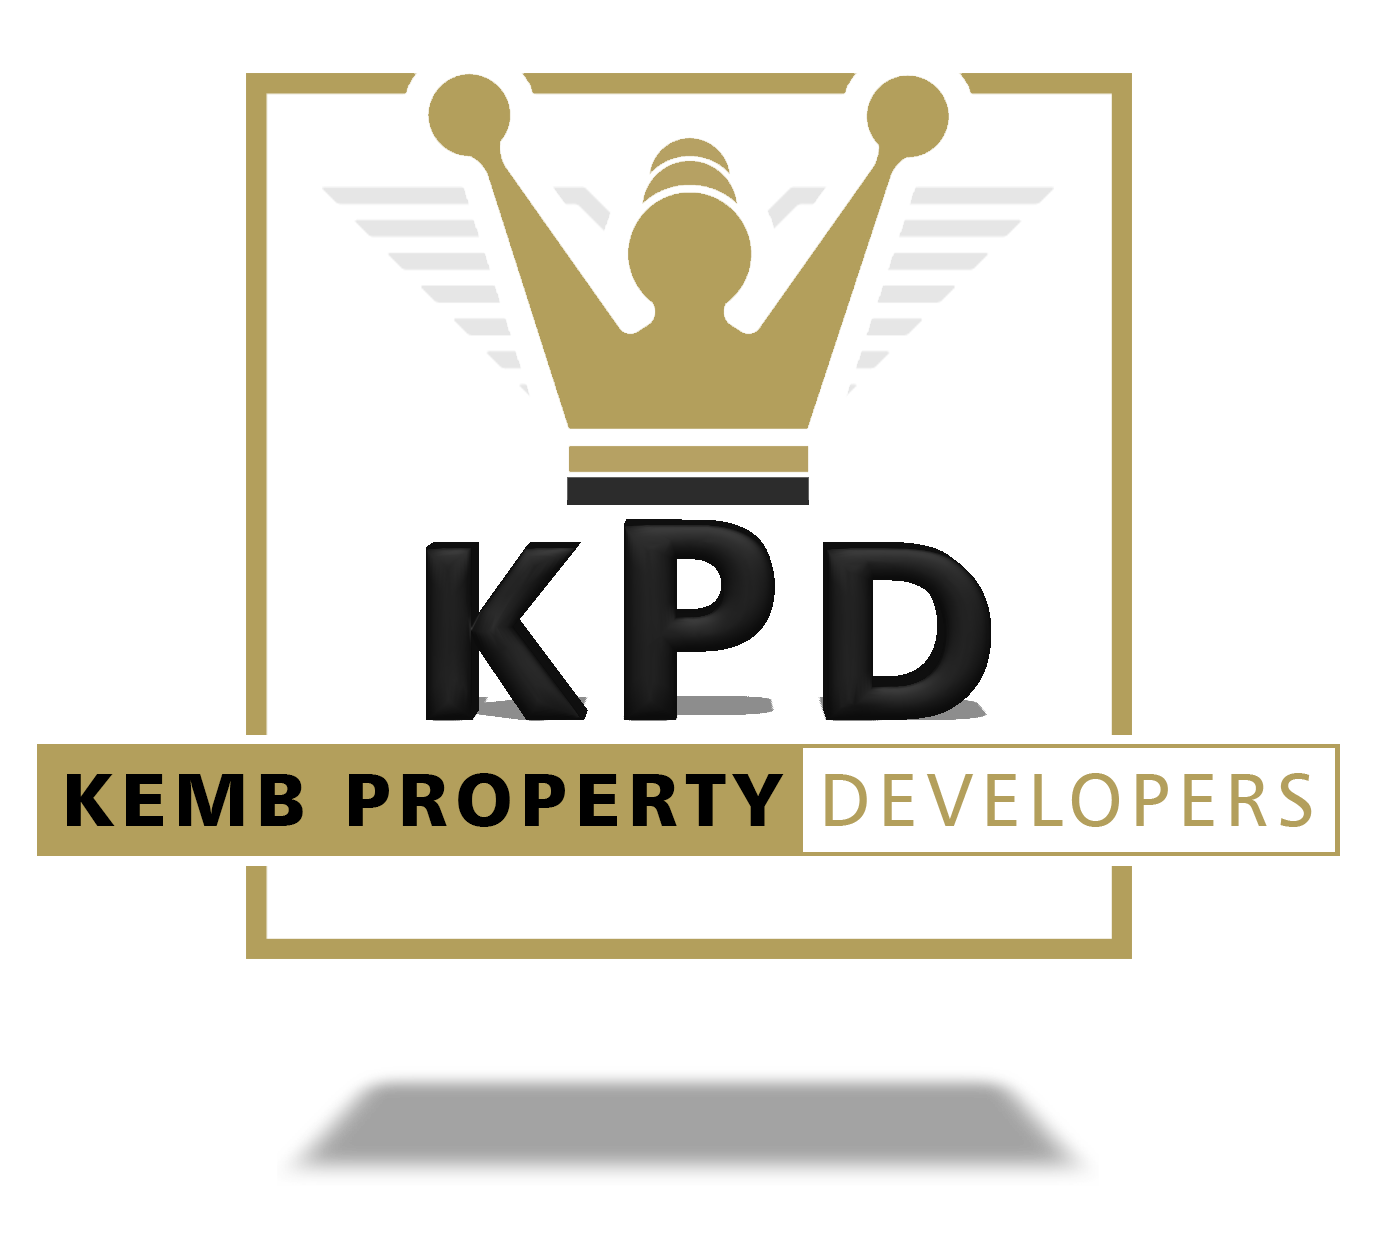 Kemb-Property-Developers